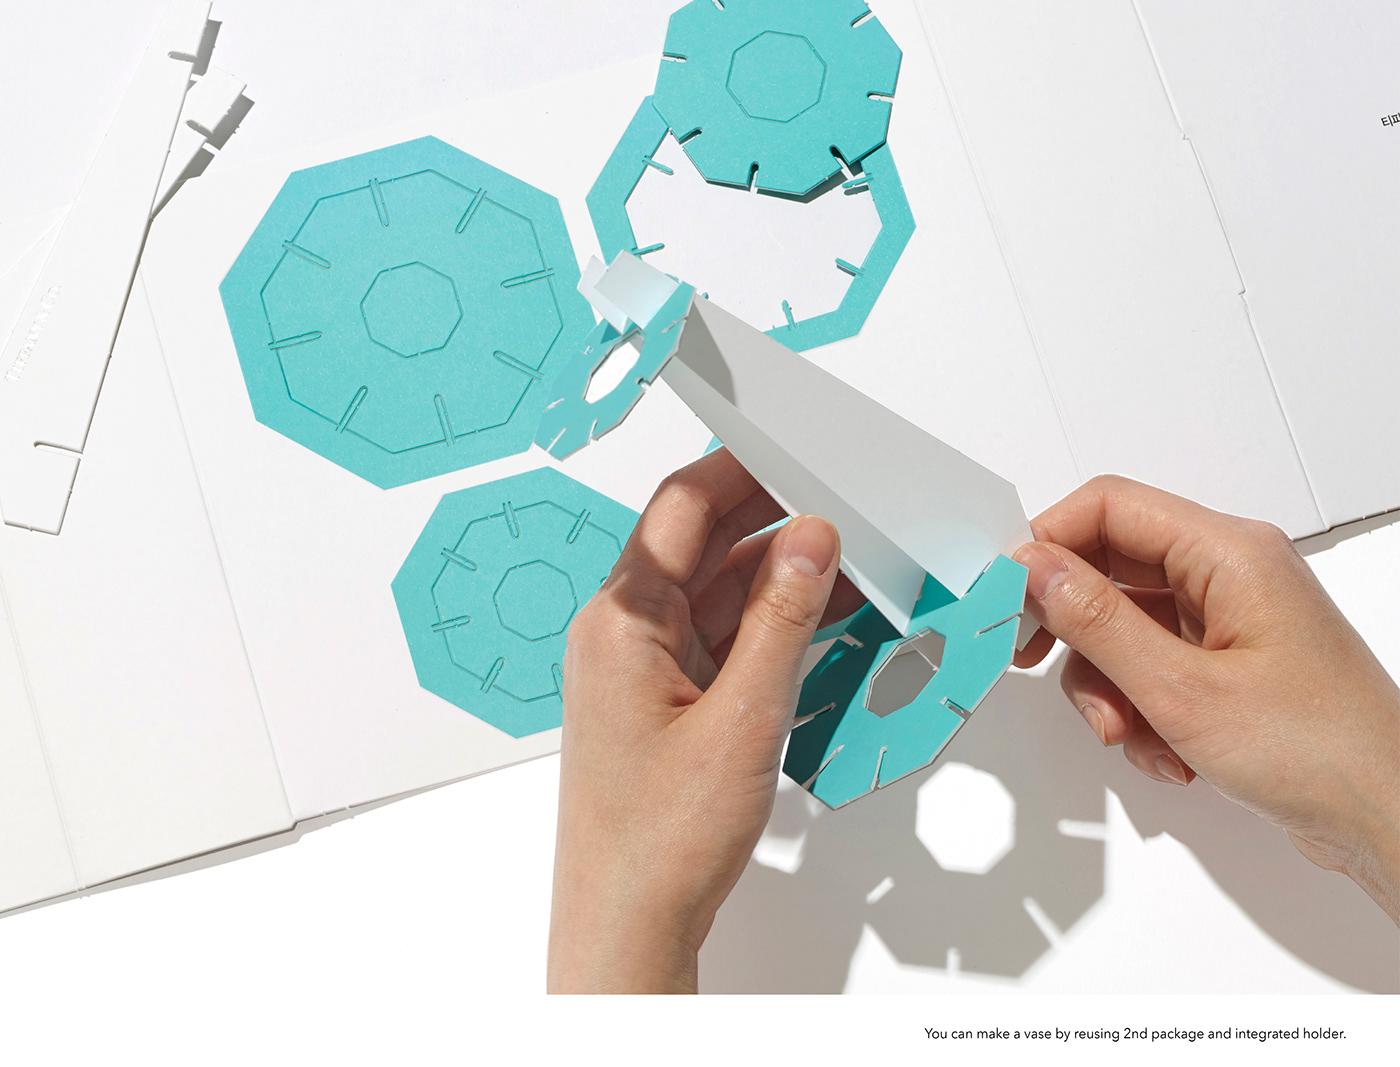 branding  gift HEAZ INFLUENCERKIT jewelry packagedesign Packaging press kit recycle tiffany